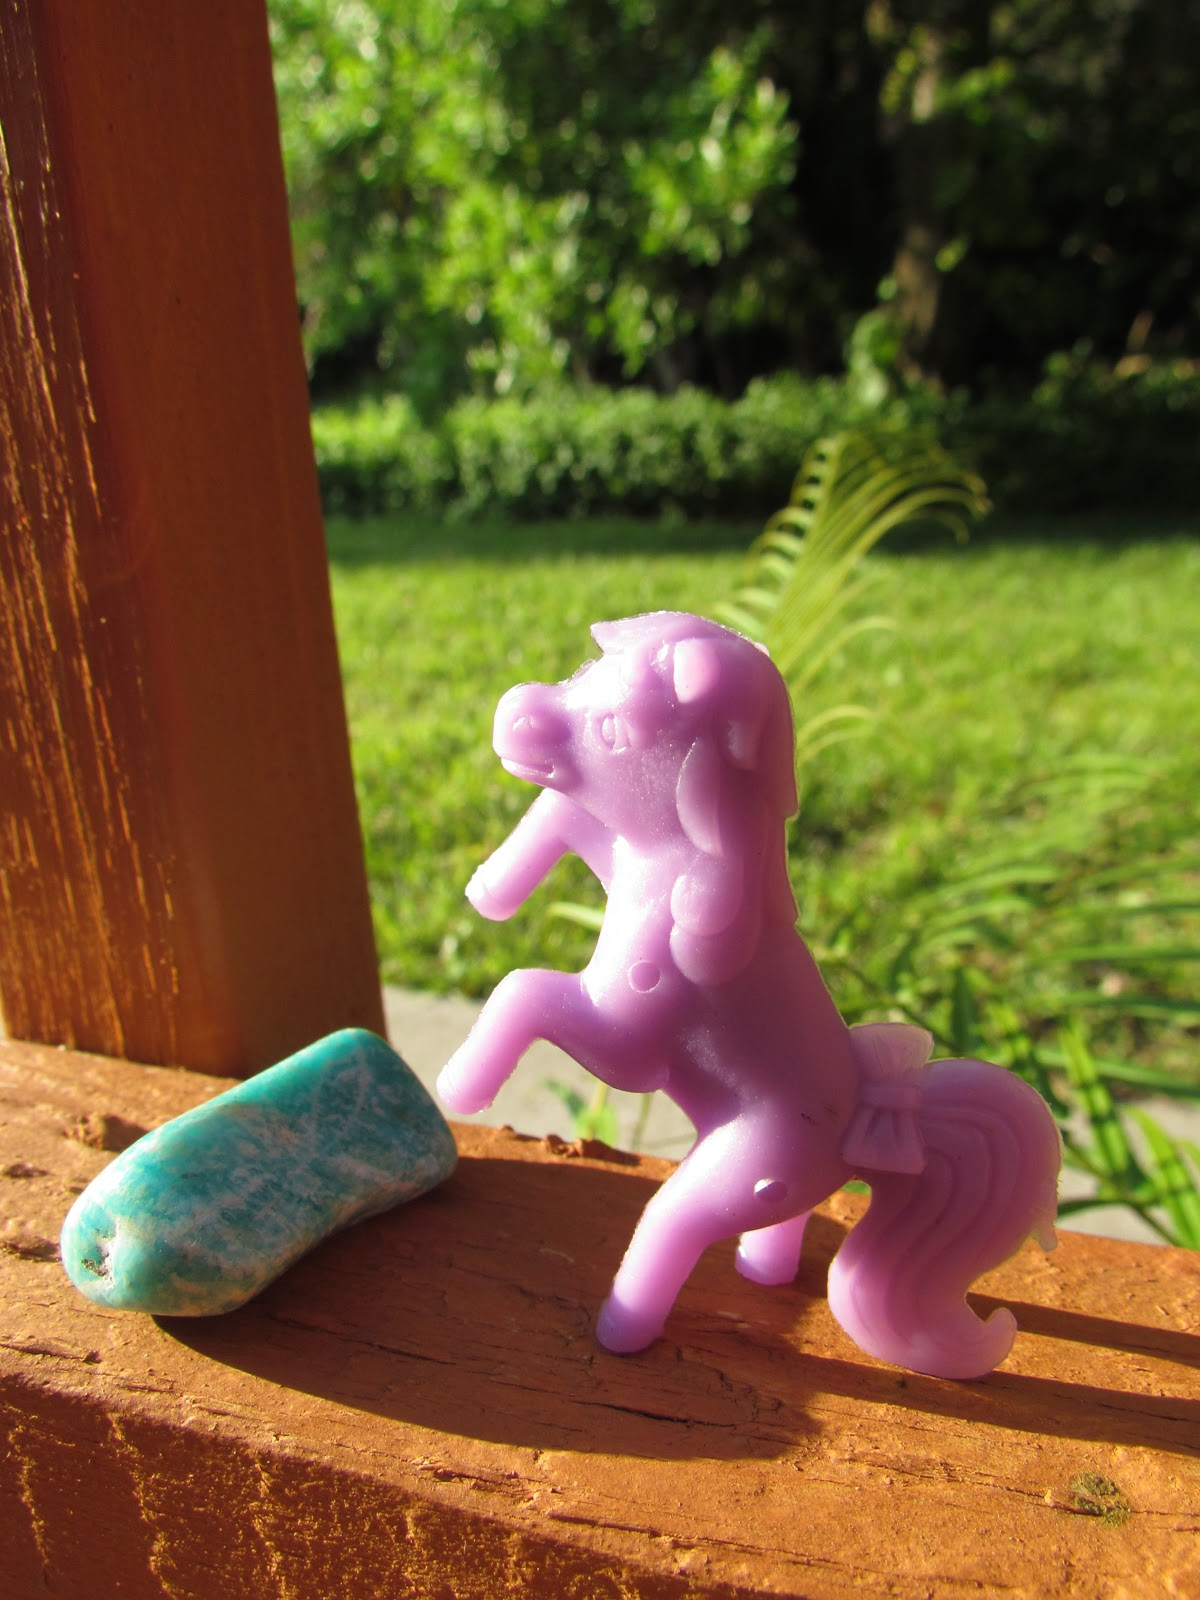 Purple Toy Unicorn Pegasus My Little Pony Figurine + Healing Stones in Nature